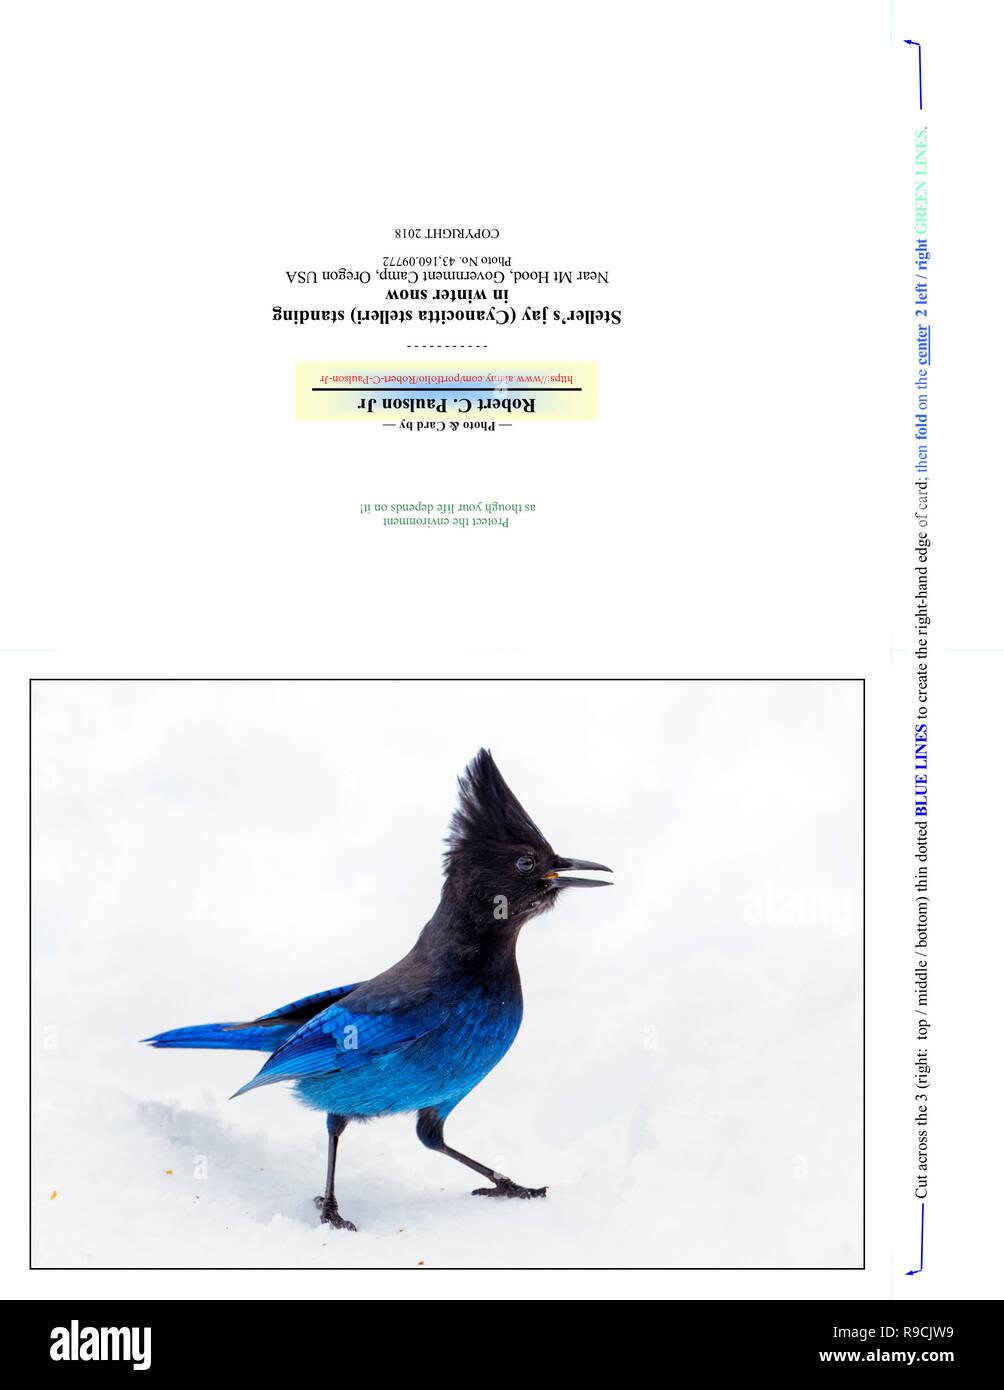 43,160.09772 Photography Note Card (print cut fold for 7x5 photo card), blue & sassy Steller's jay bird (Cyanocitta stelleri) standing in winter snow - Stock Image